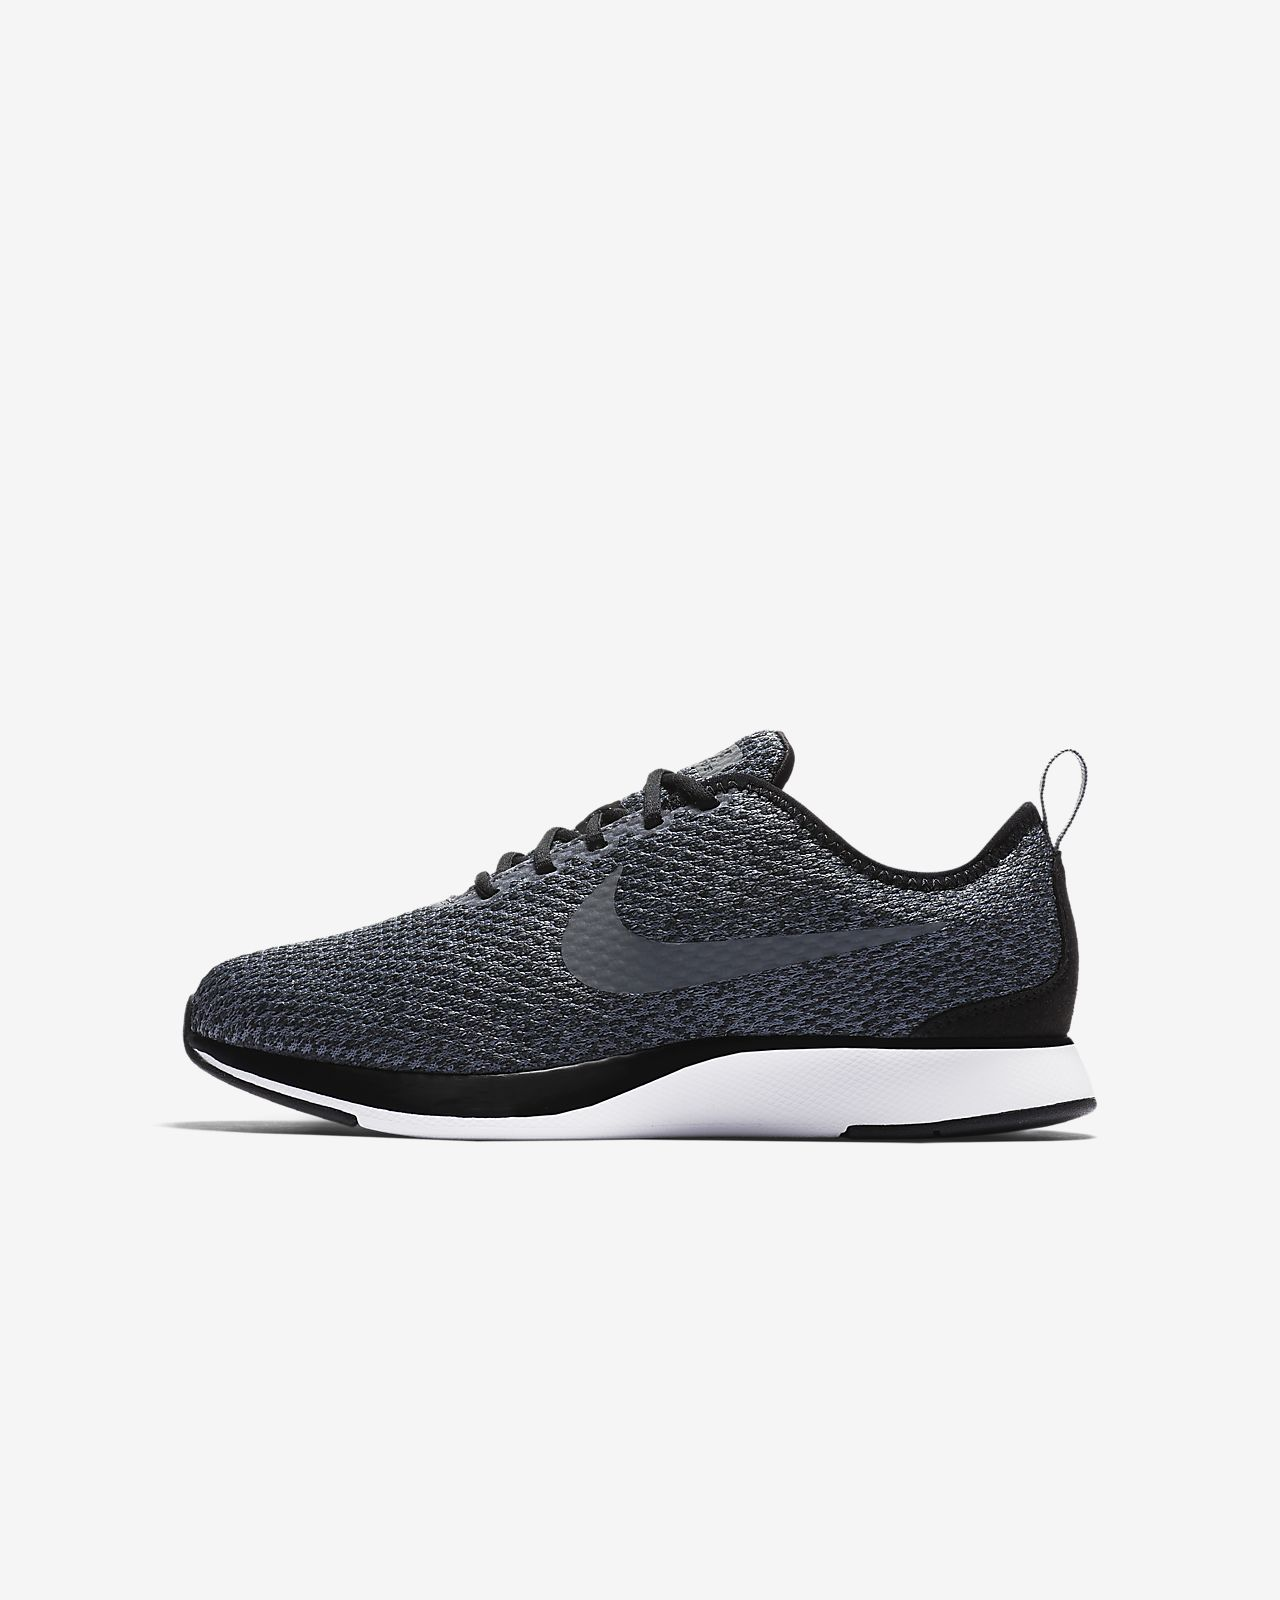 DUALTONE RACER - CALZADO - Sneakers & Deportivas Nike zGdvIwnyV